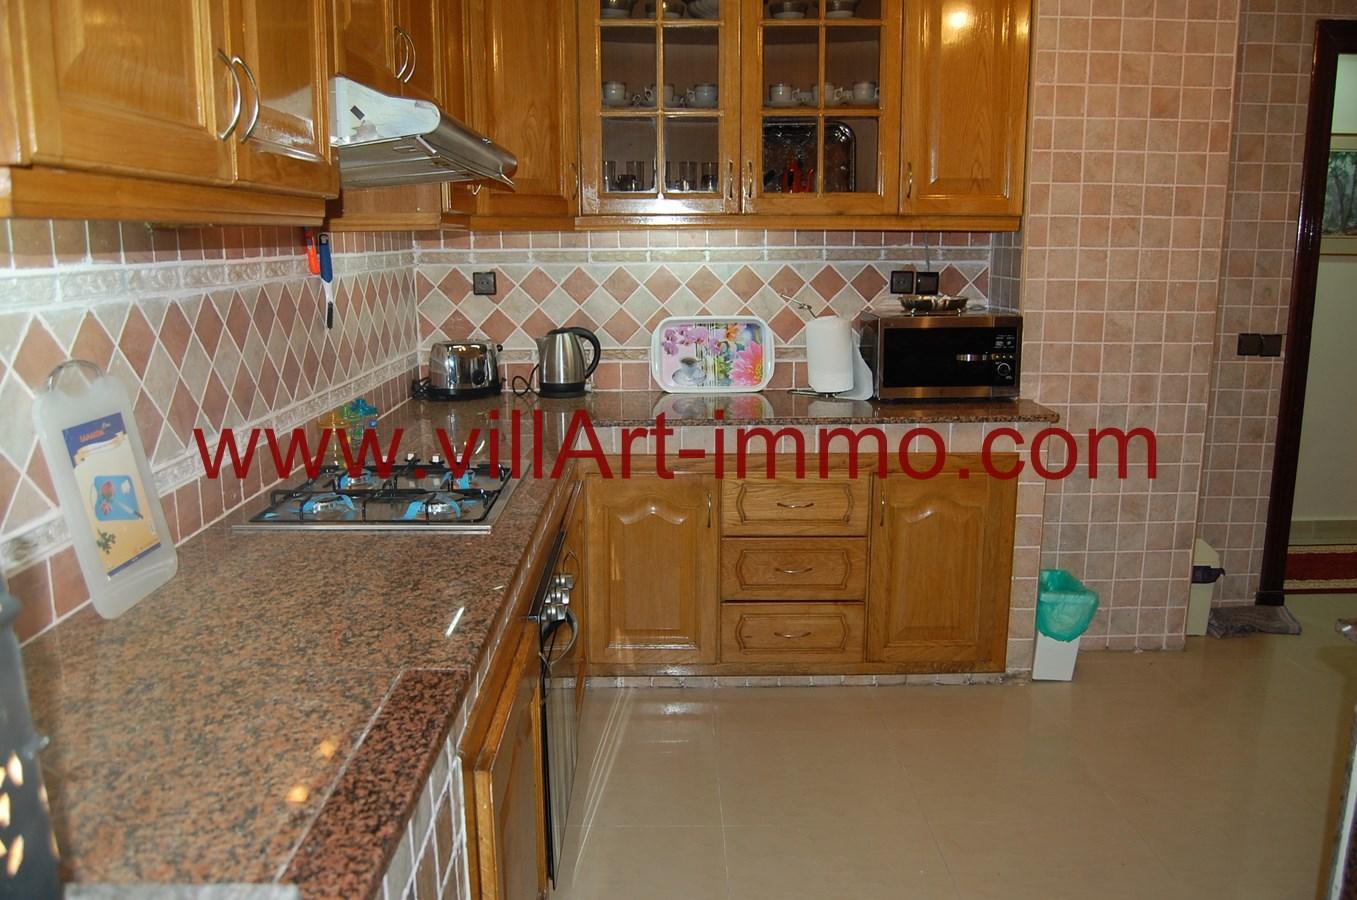 7-location-appartement-meuble-iberia-tanger-cuisine-l895-villart-immo